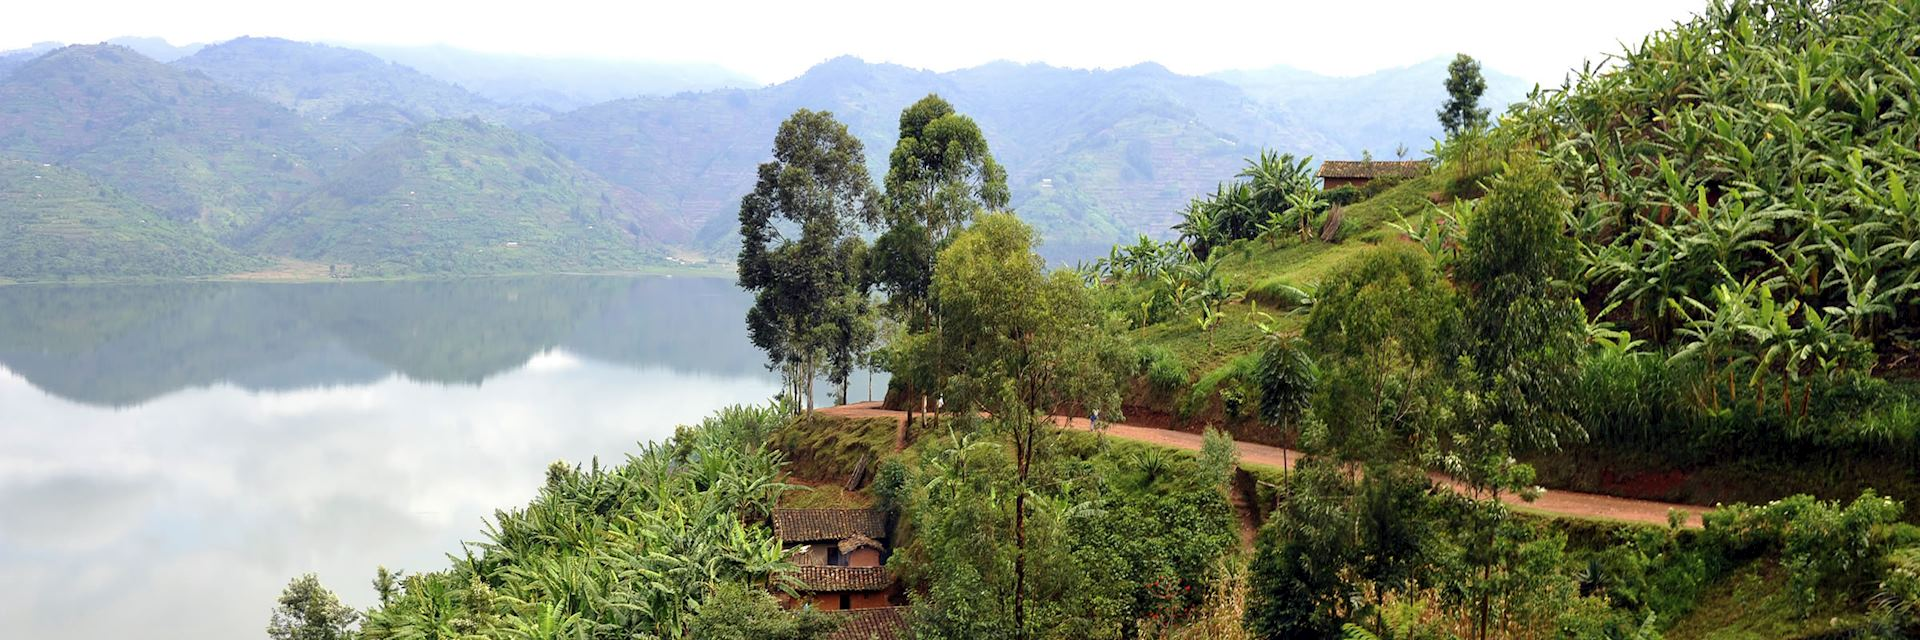 Lake Ruhondo in Rwanda